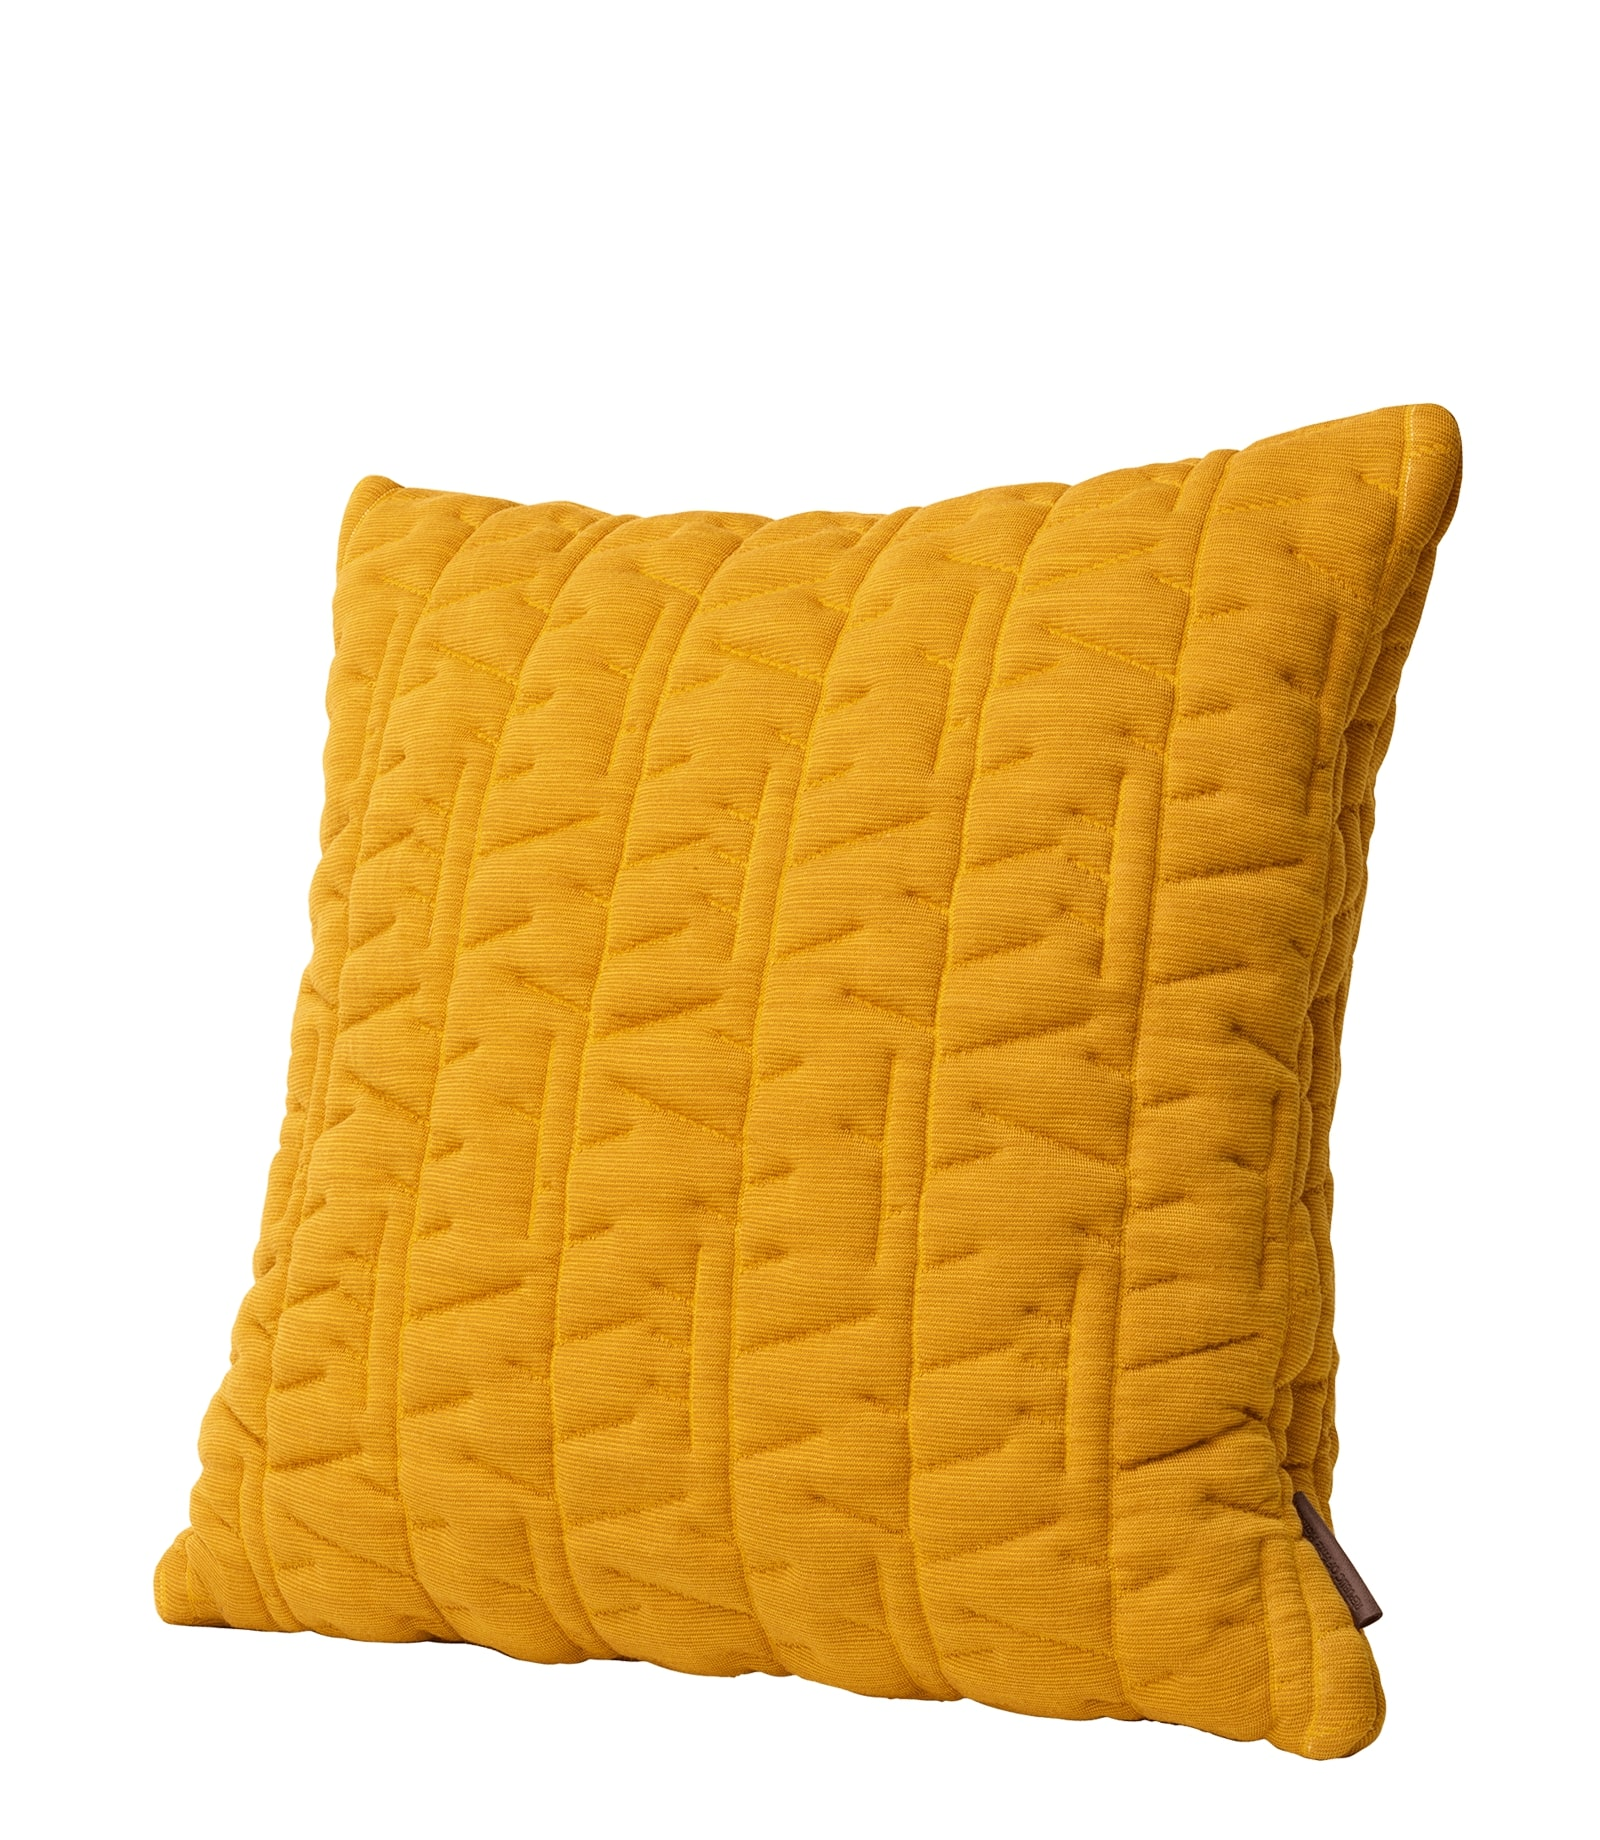 Fritz Hansen AJ Tassel pyntepude, 45x45 cm, ochre yellow